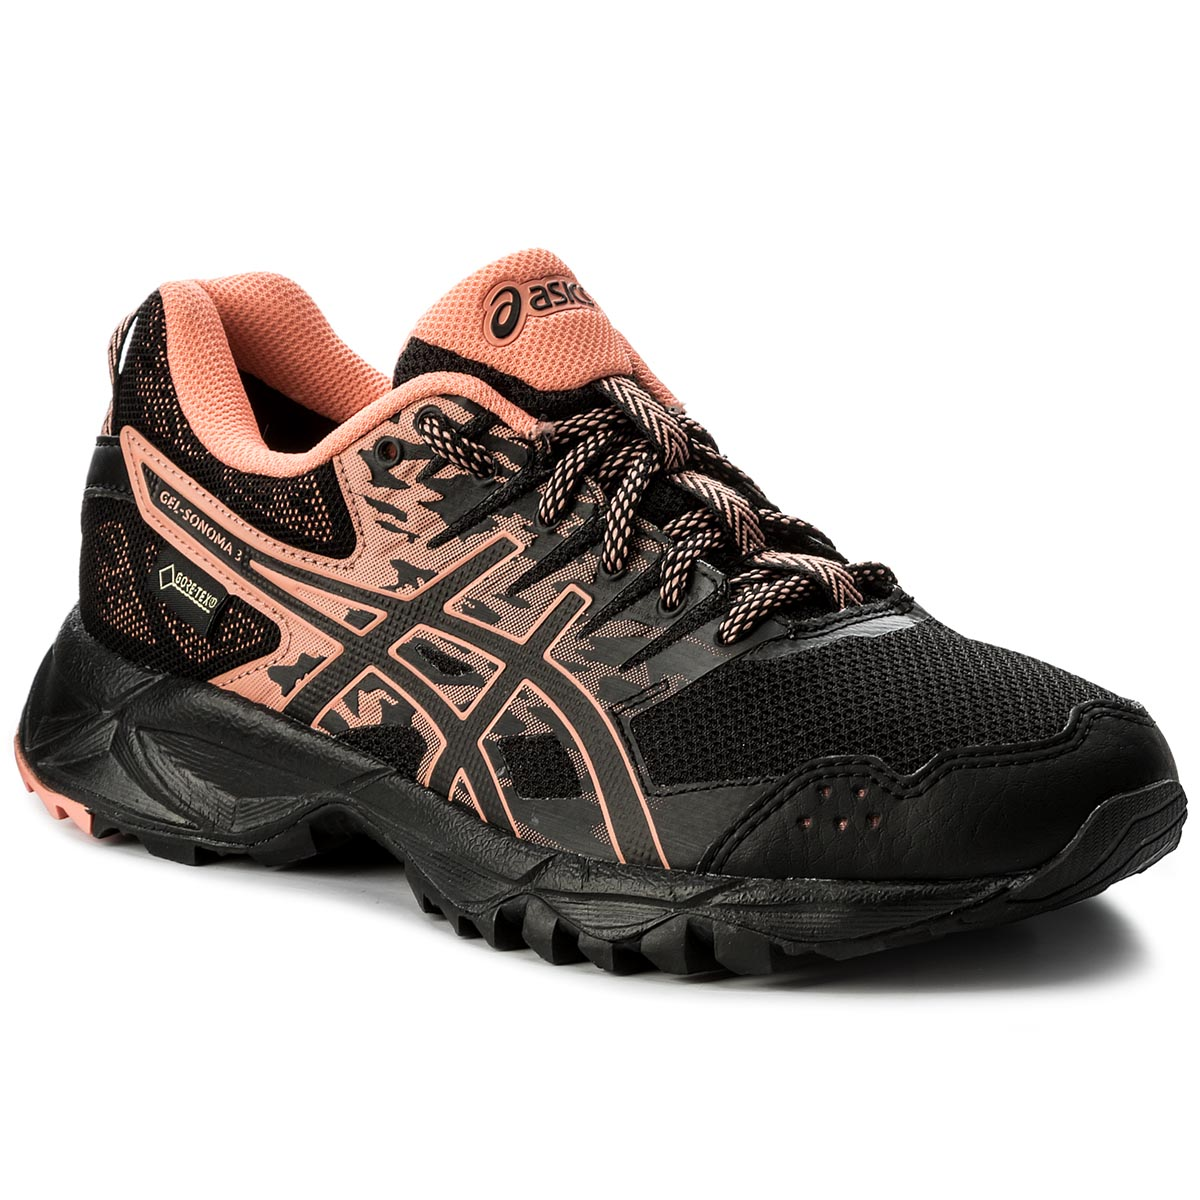 Chaussures ASICS Gel Shocking Contend 4 Gs Gs C707N 4 Noir/ Fiery Red/ Shocking Orange f621bab - caillouoyunlari.info